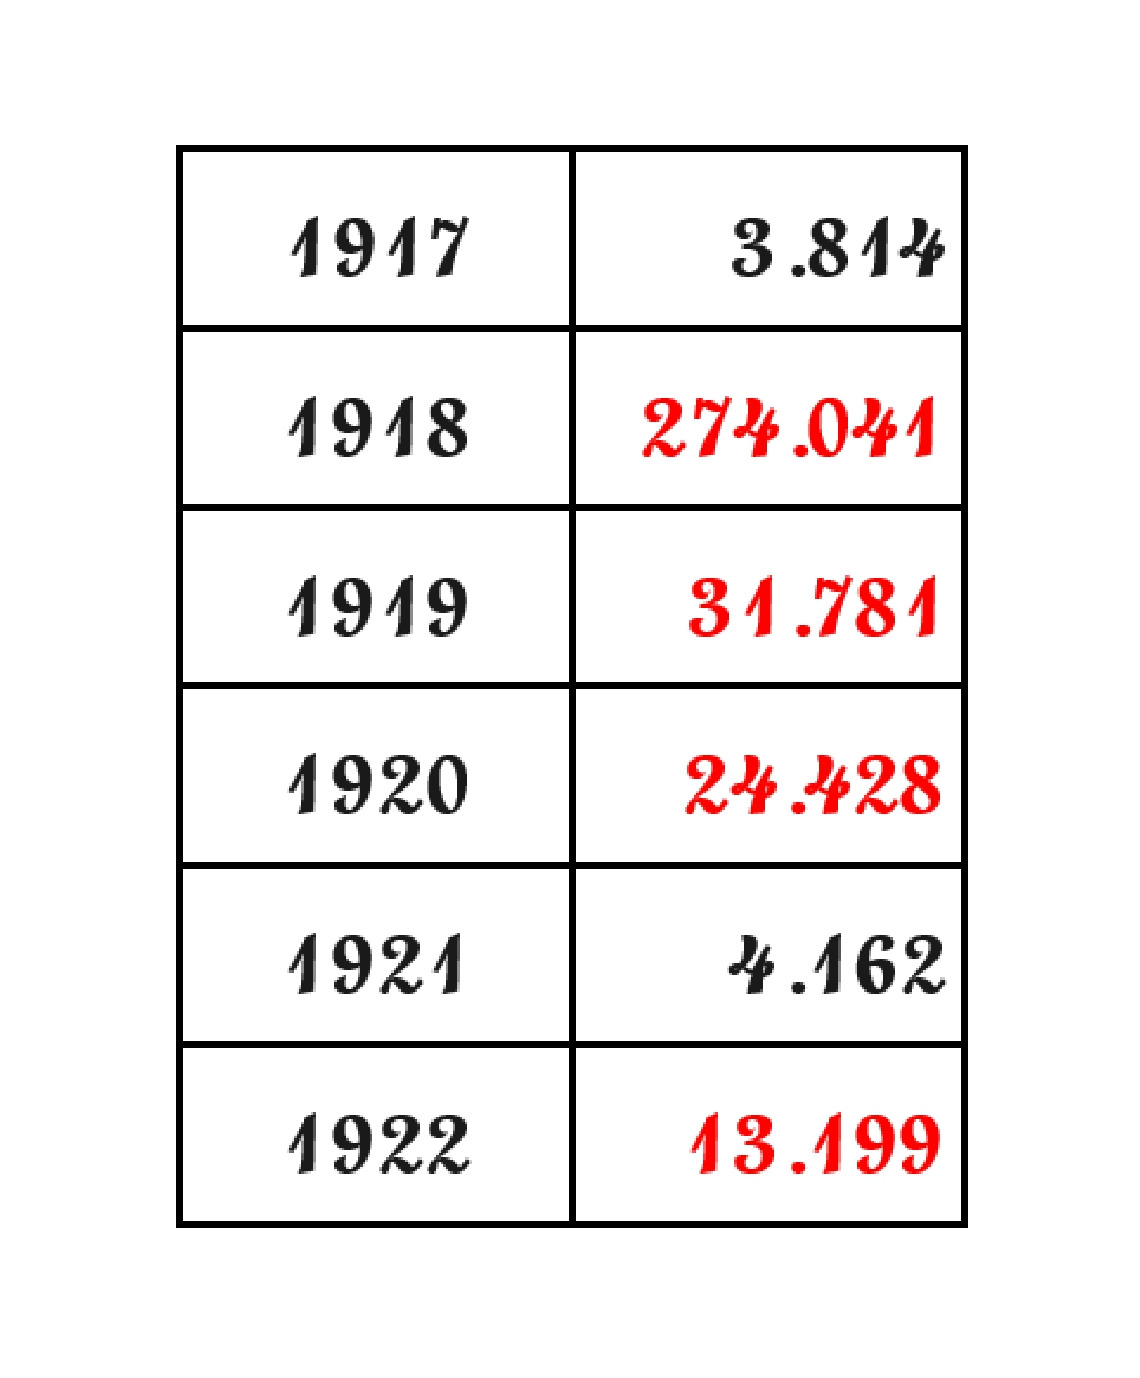 Morti d'influenza dal 1917 al 1922.